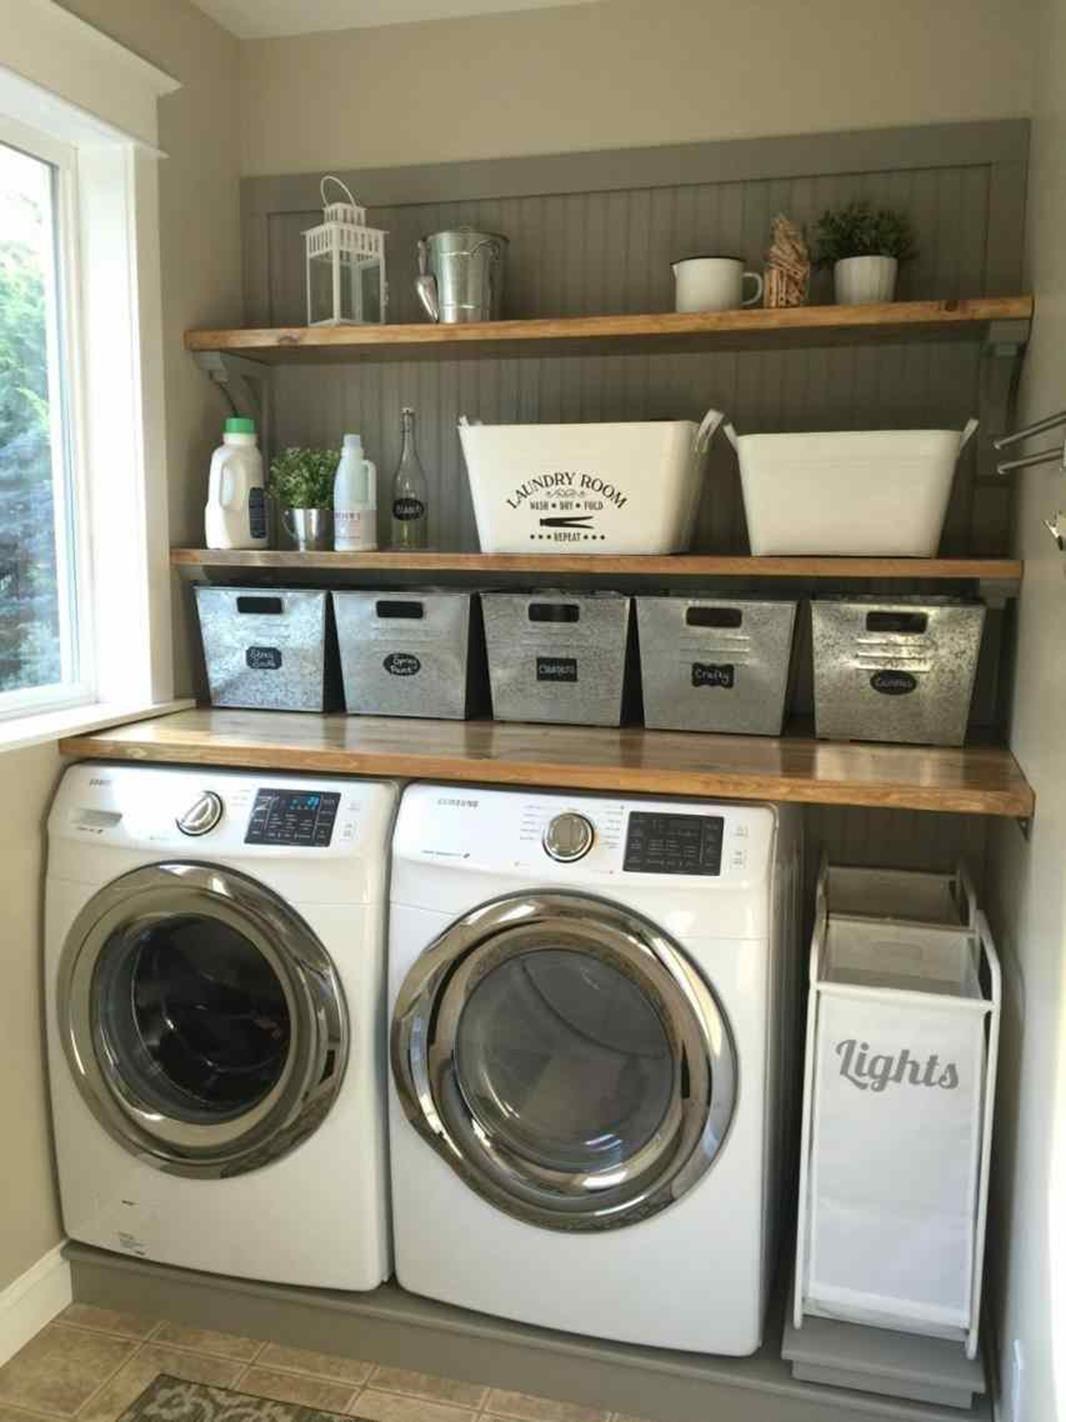 Best Cheap Ikea Cabinets Laundry Room Storage Ideas 14 Laundry